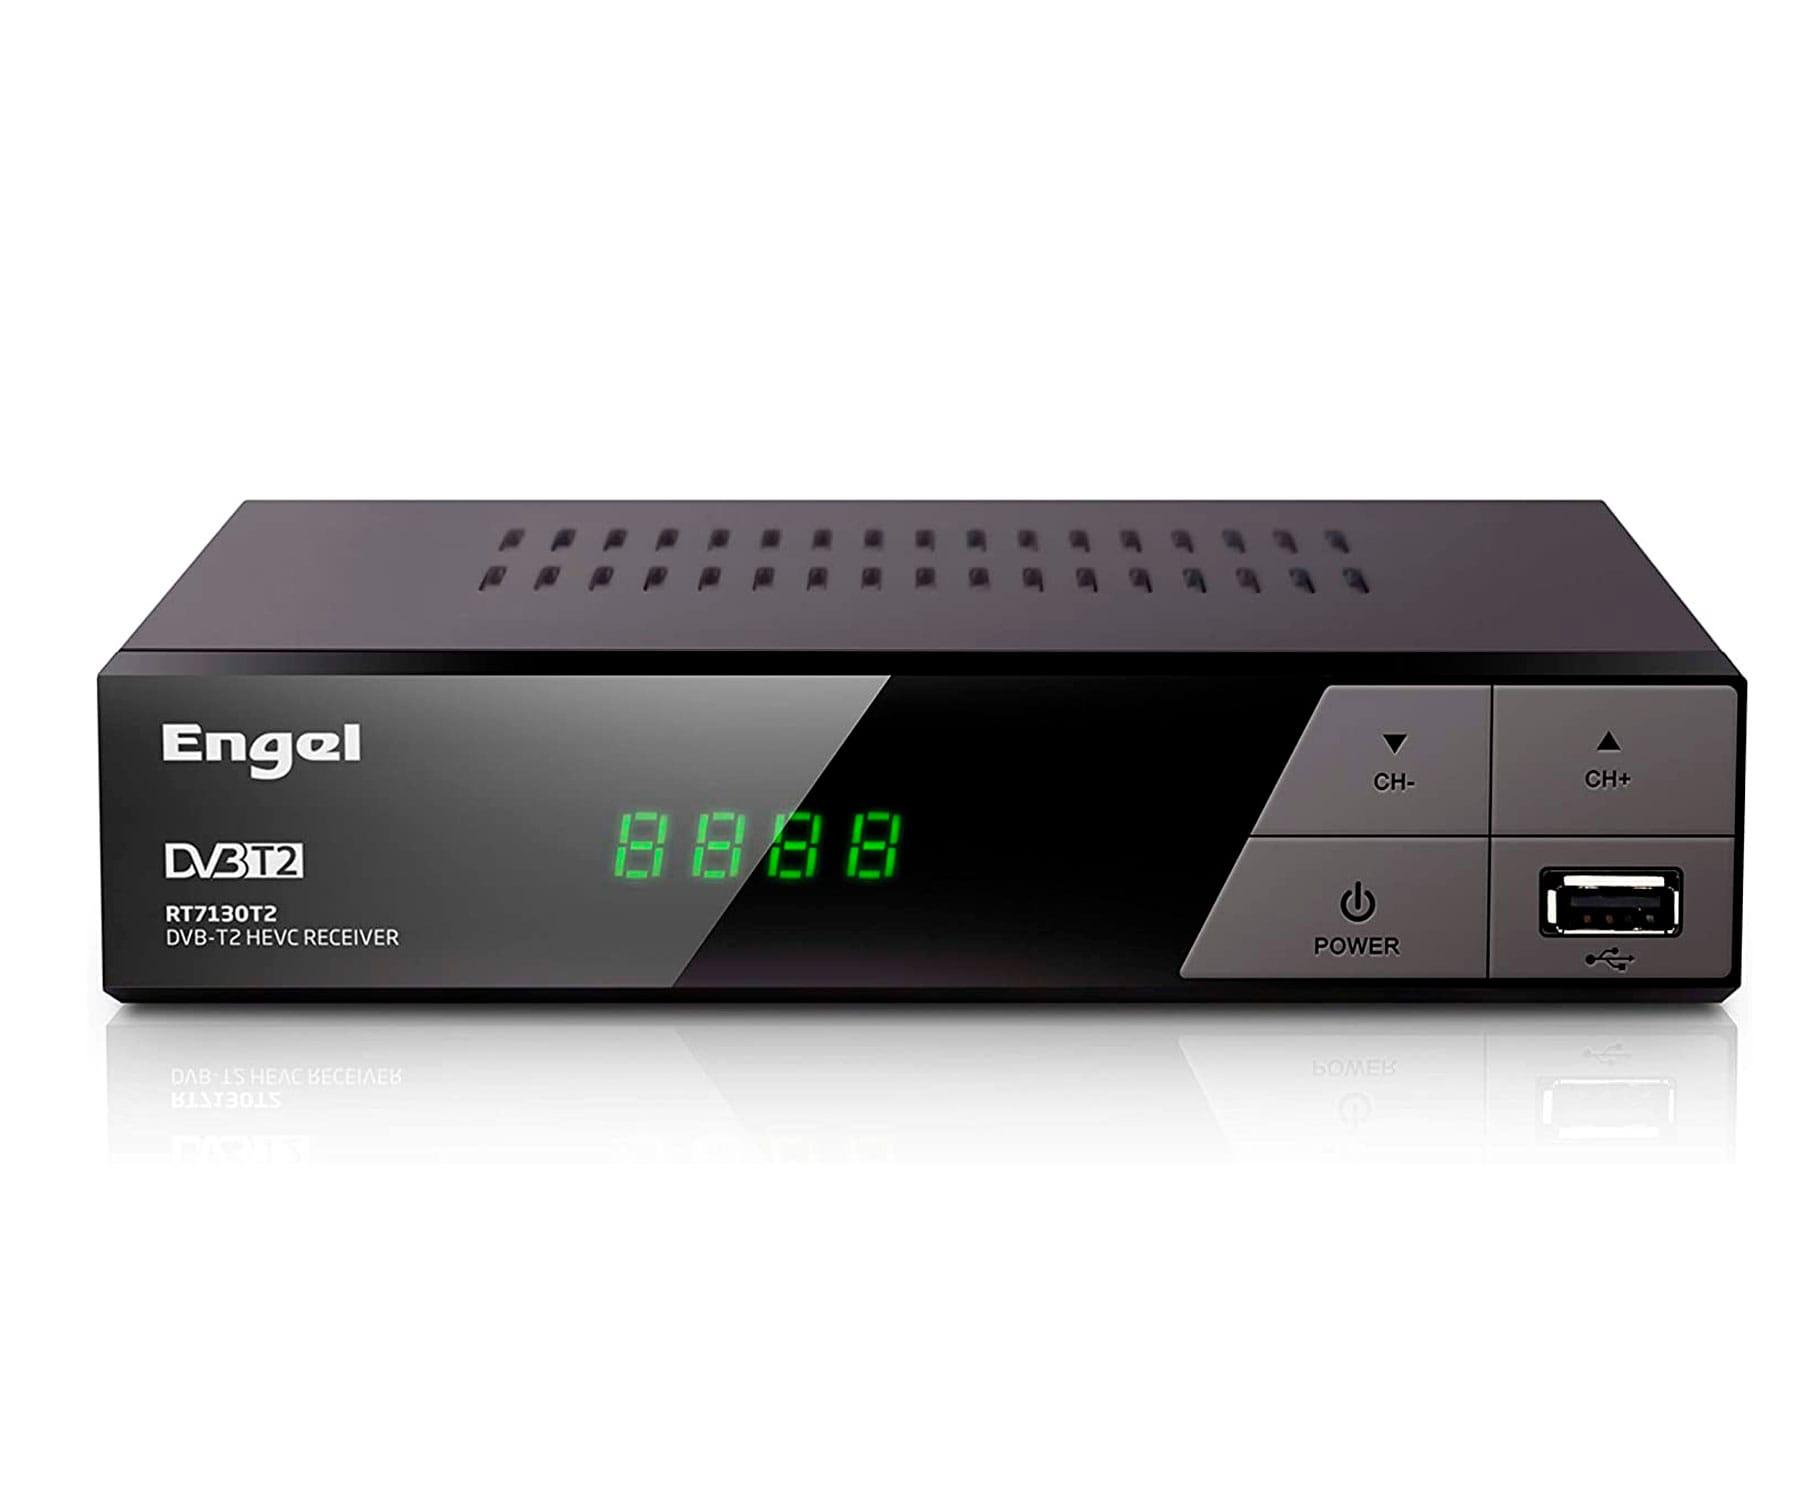 ENGEL RT7130T2 DVB-T2 HEVC/GRABADOR RECEPTOR DIGITAL TERRESTRE/HD Y SD/FUNCIÓN TIMESHIFT